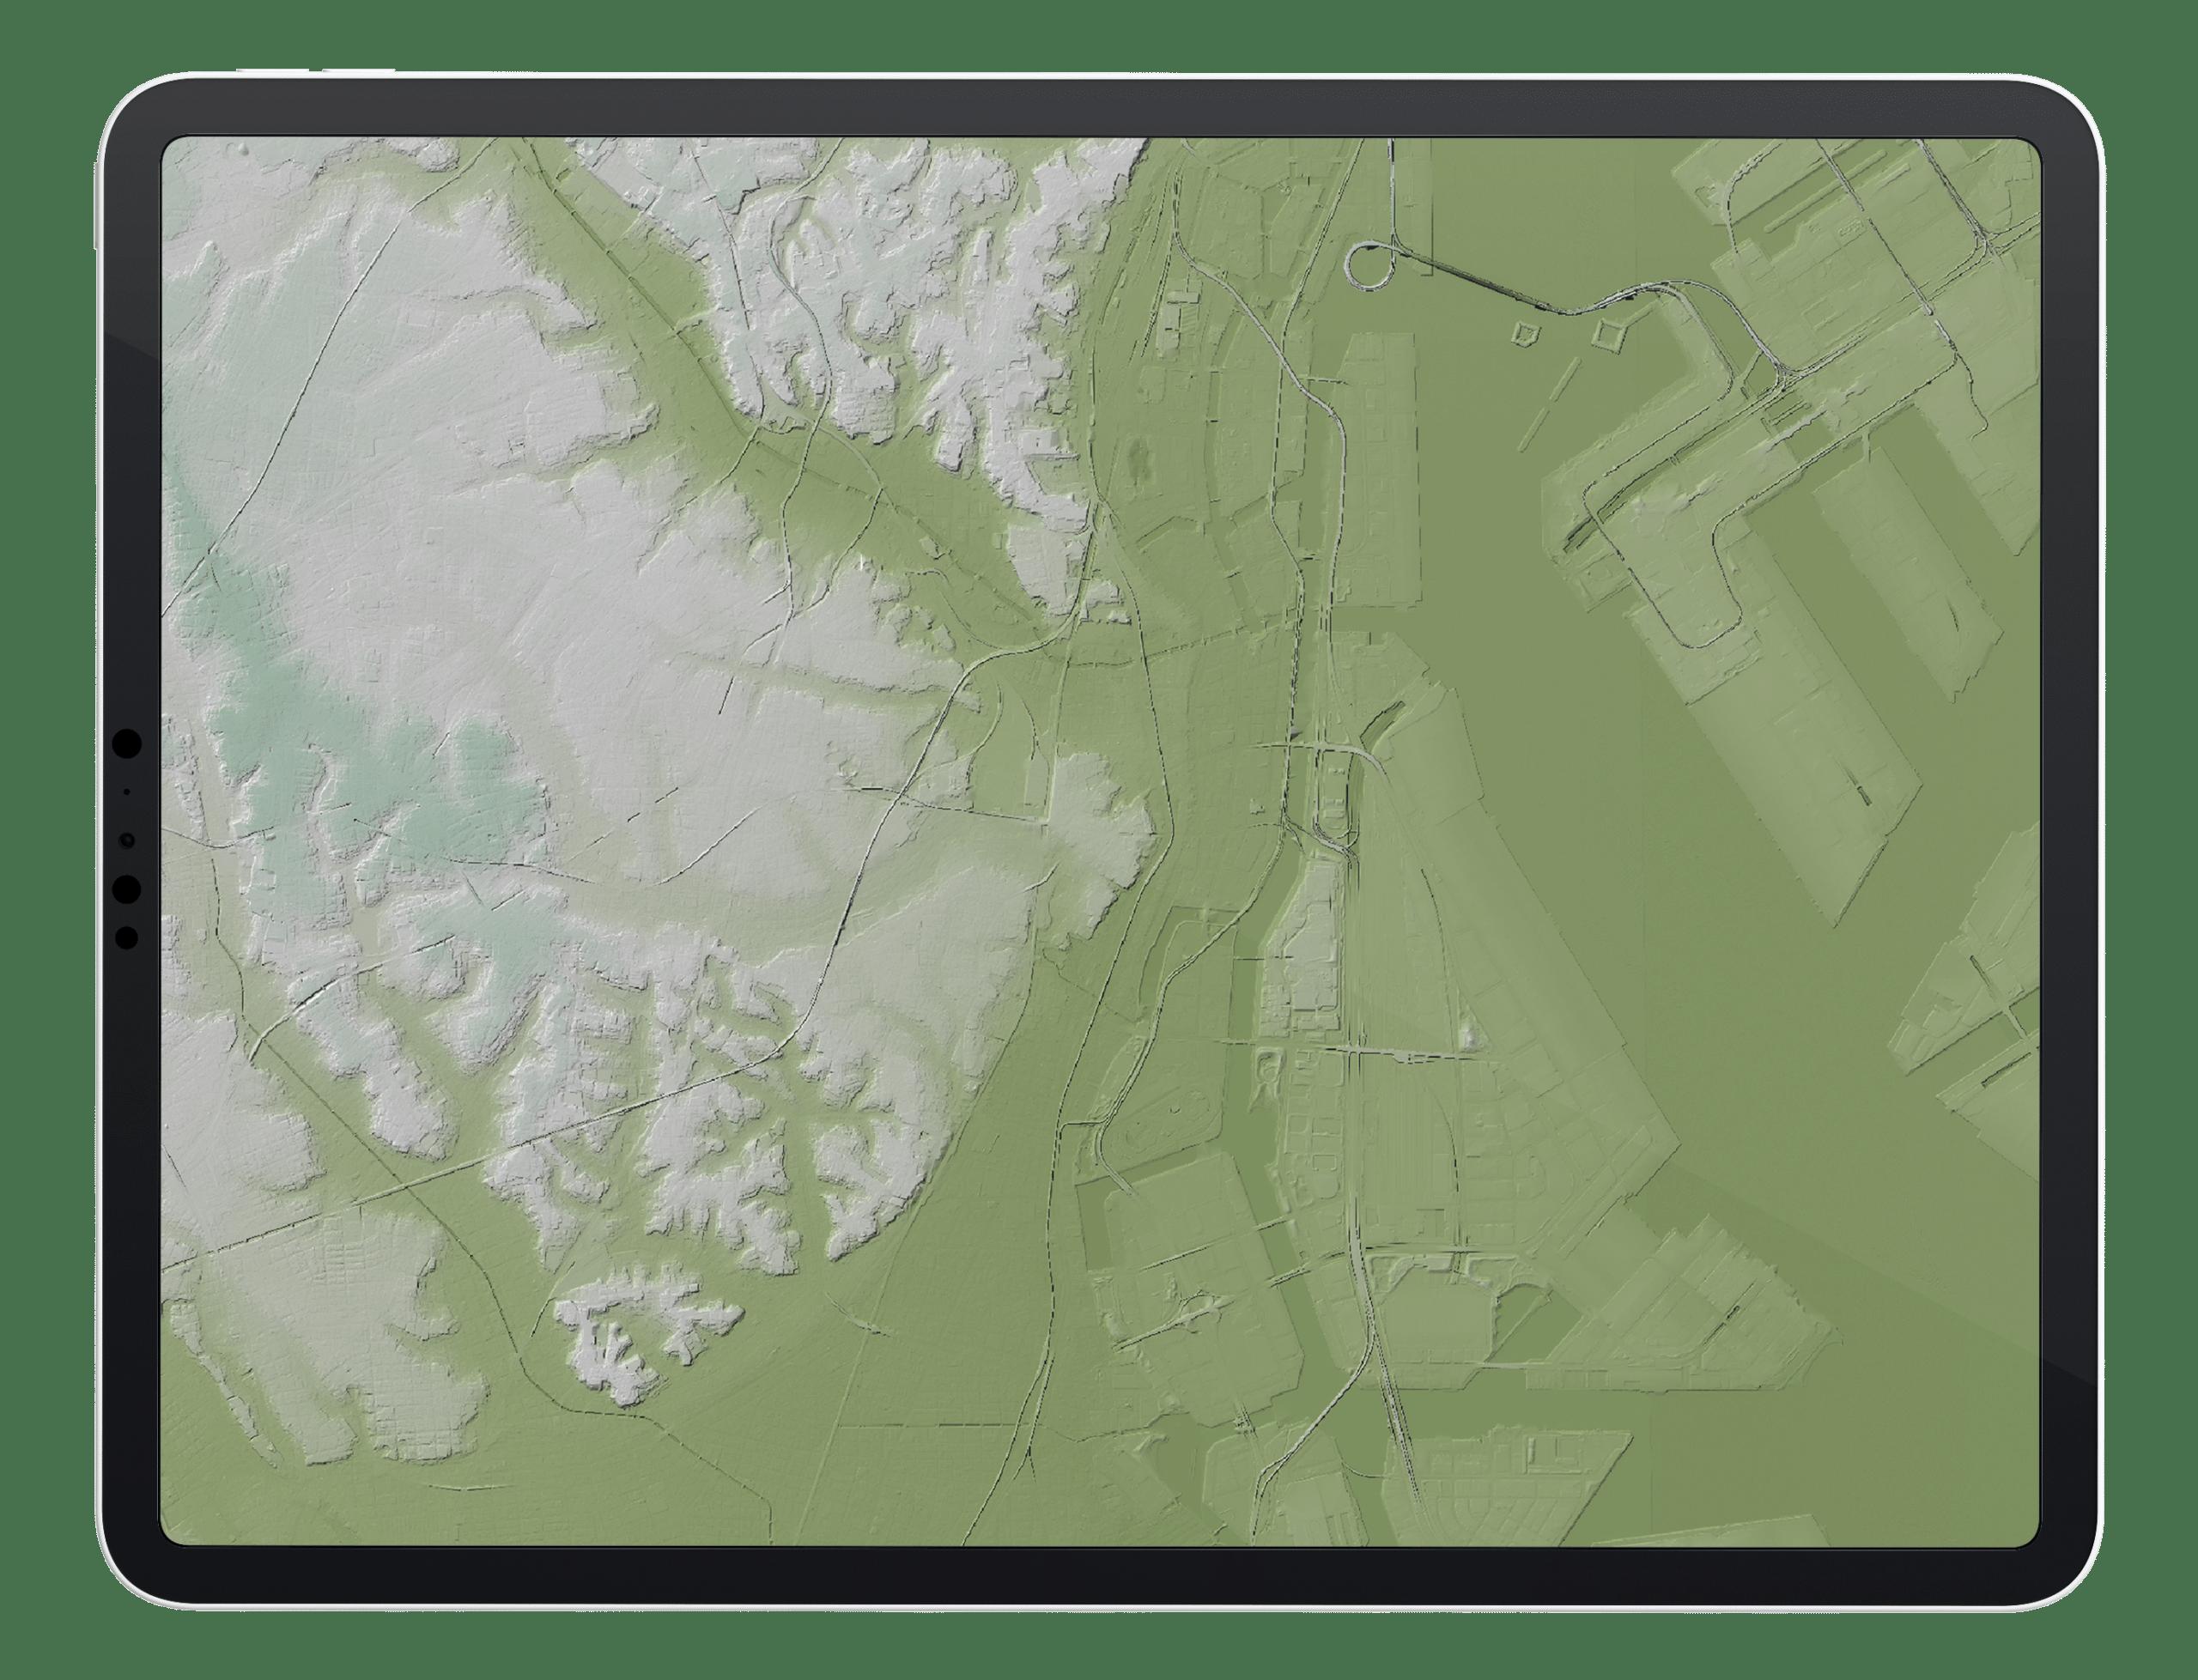 Digital Terrain Map on Tablet